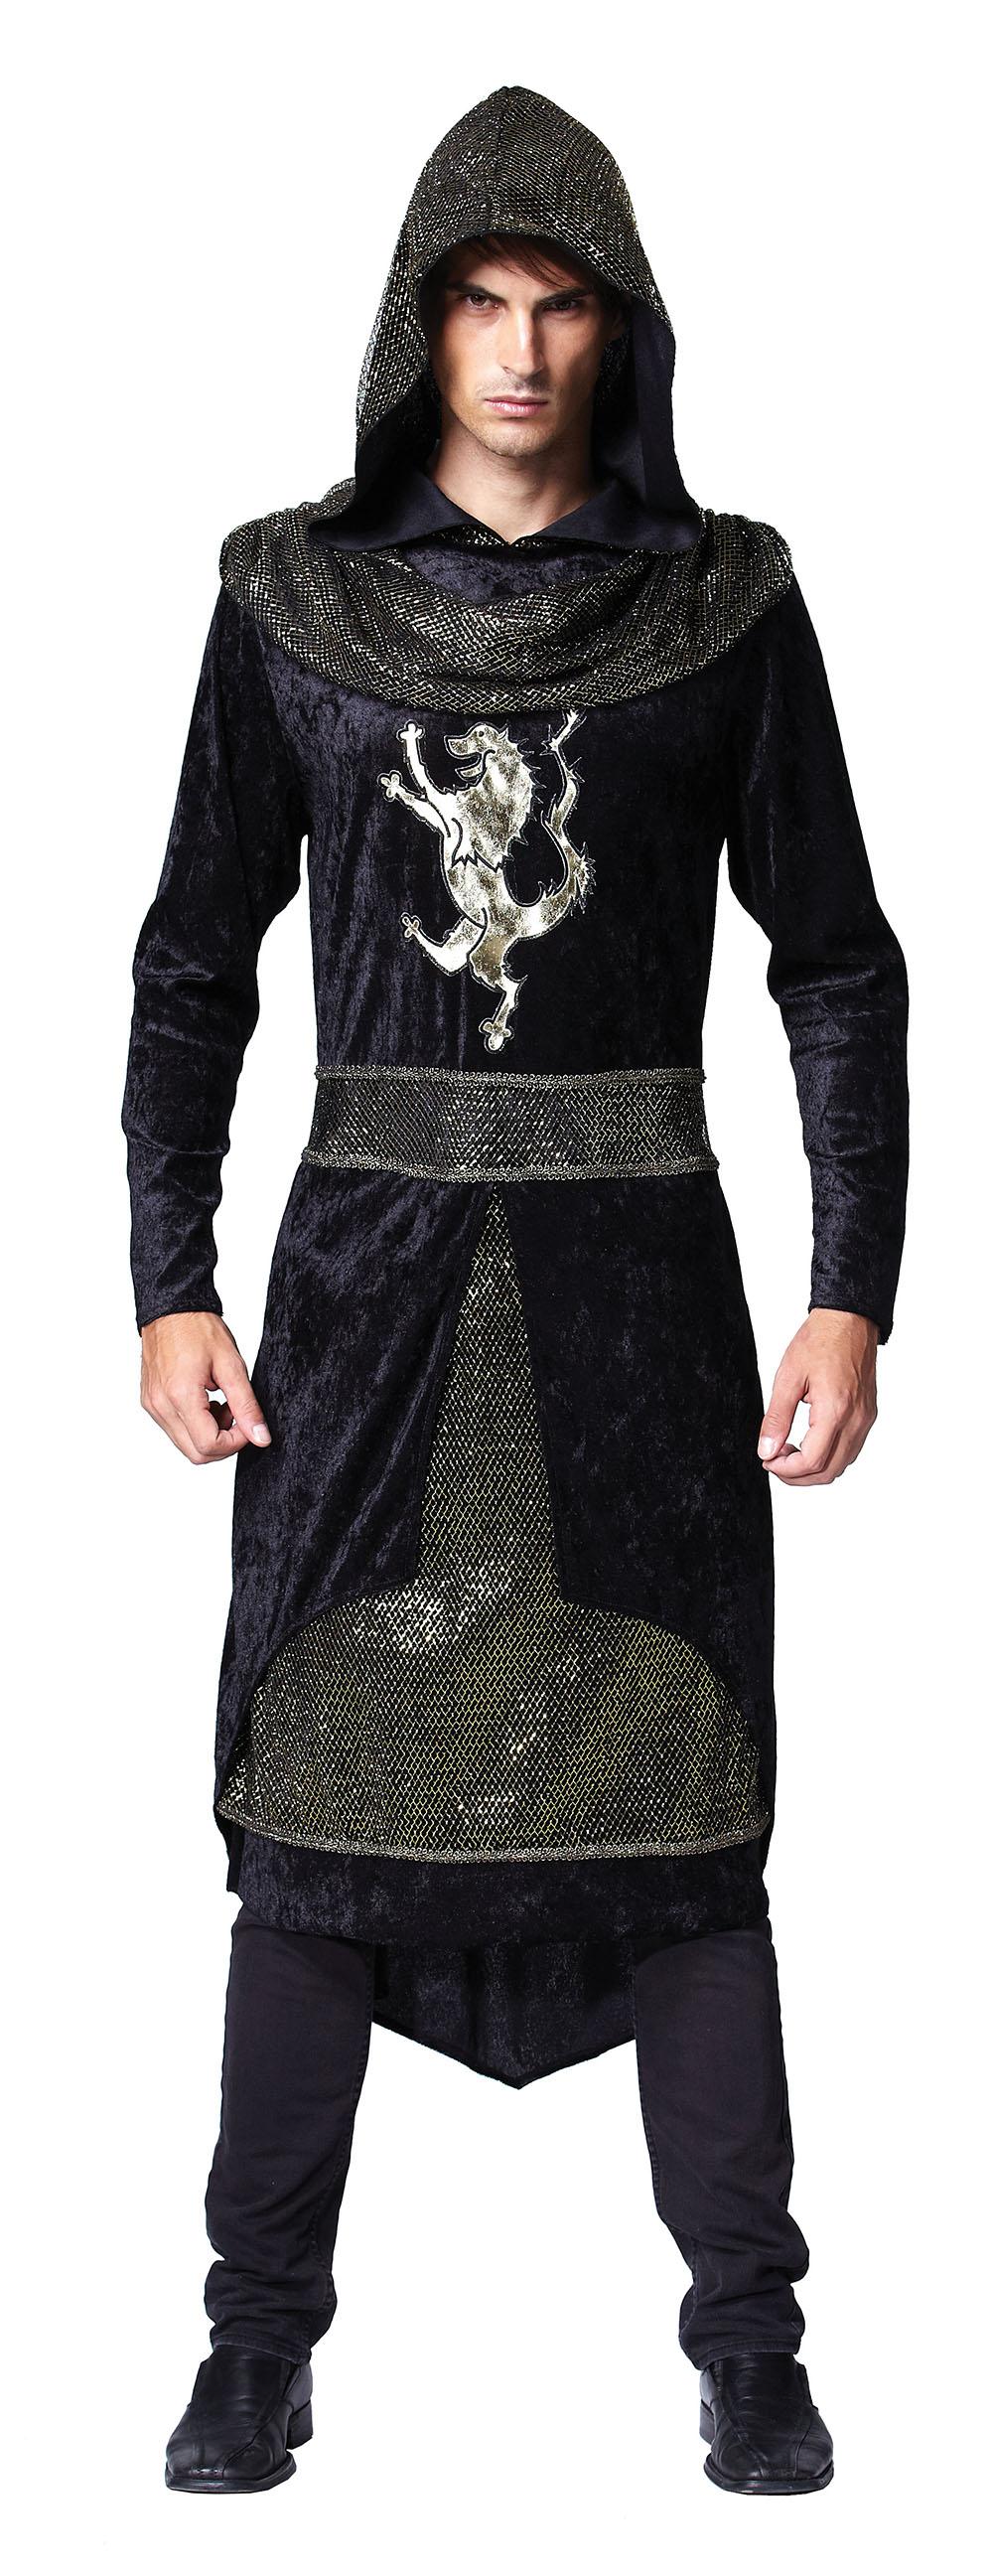 King Costume Medieval or Renaissance Prince Adult